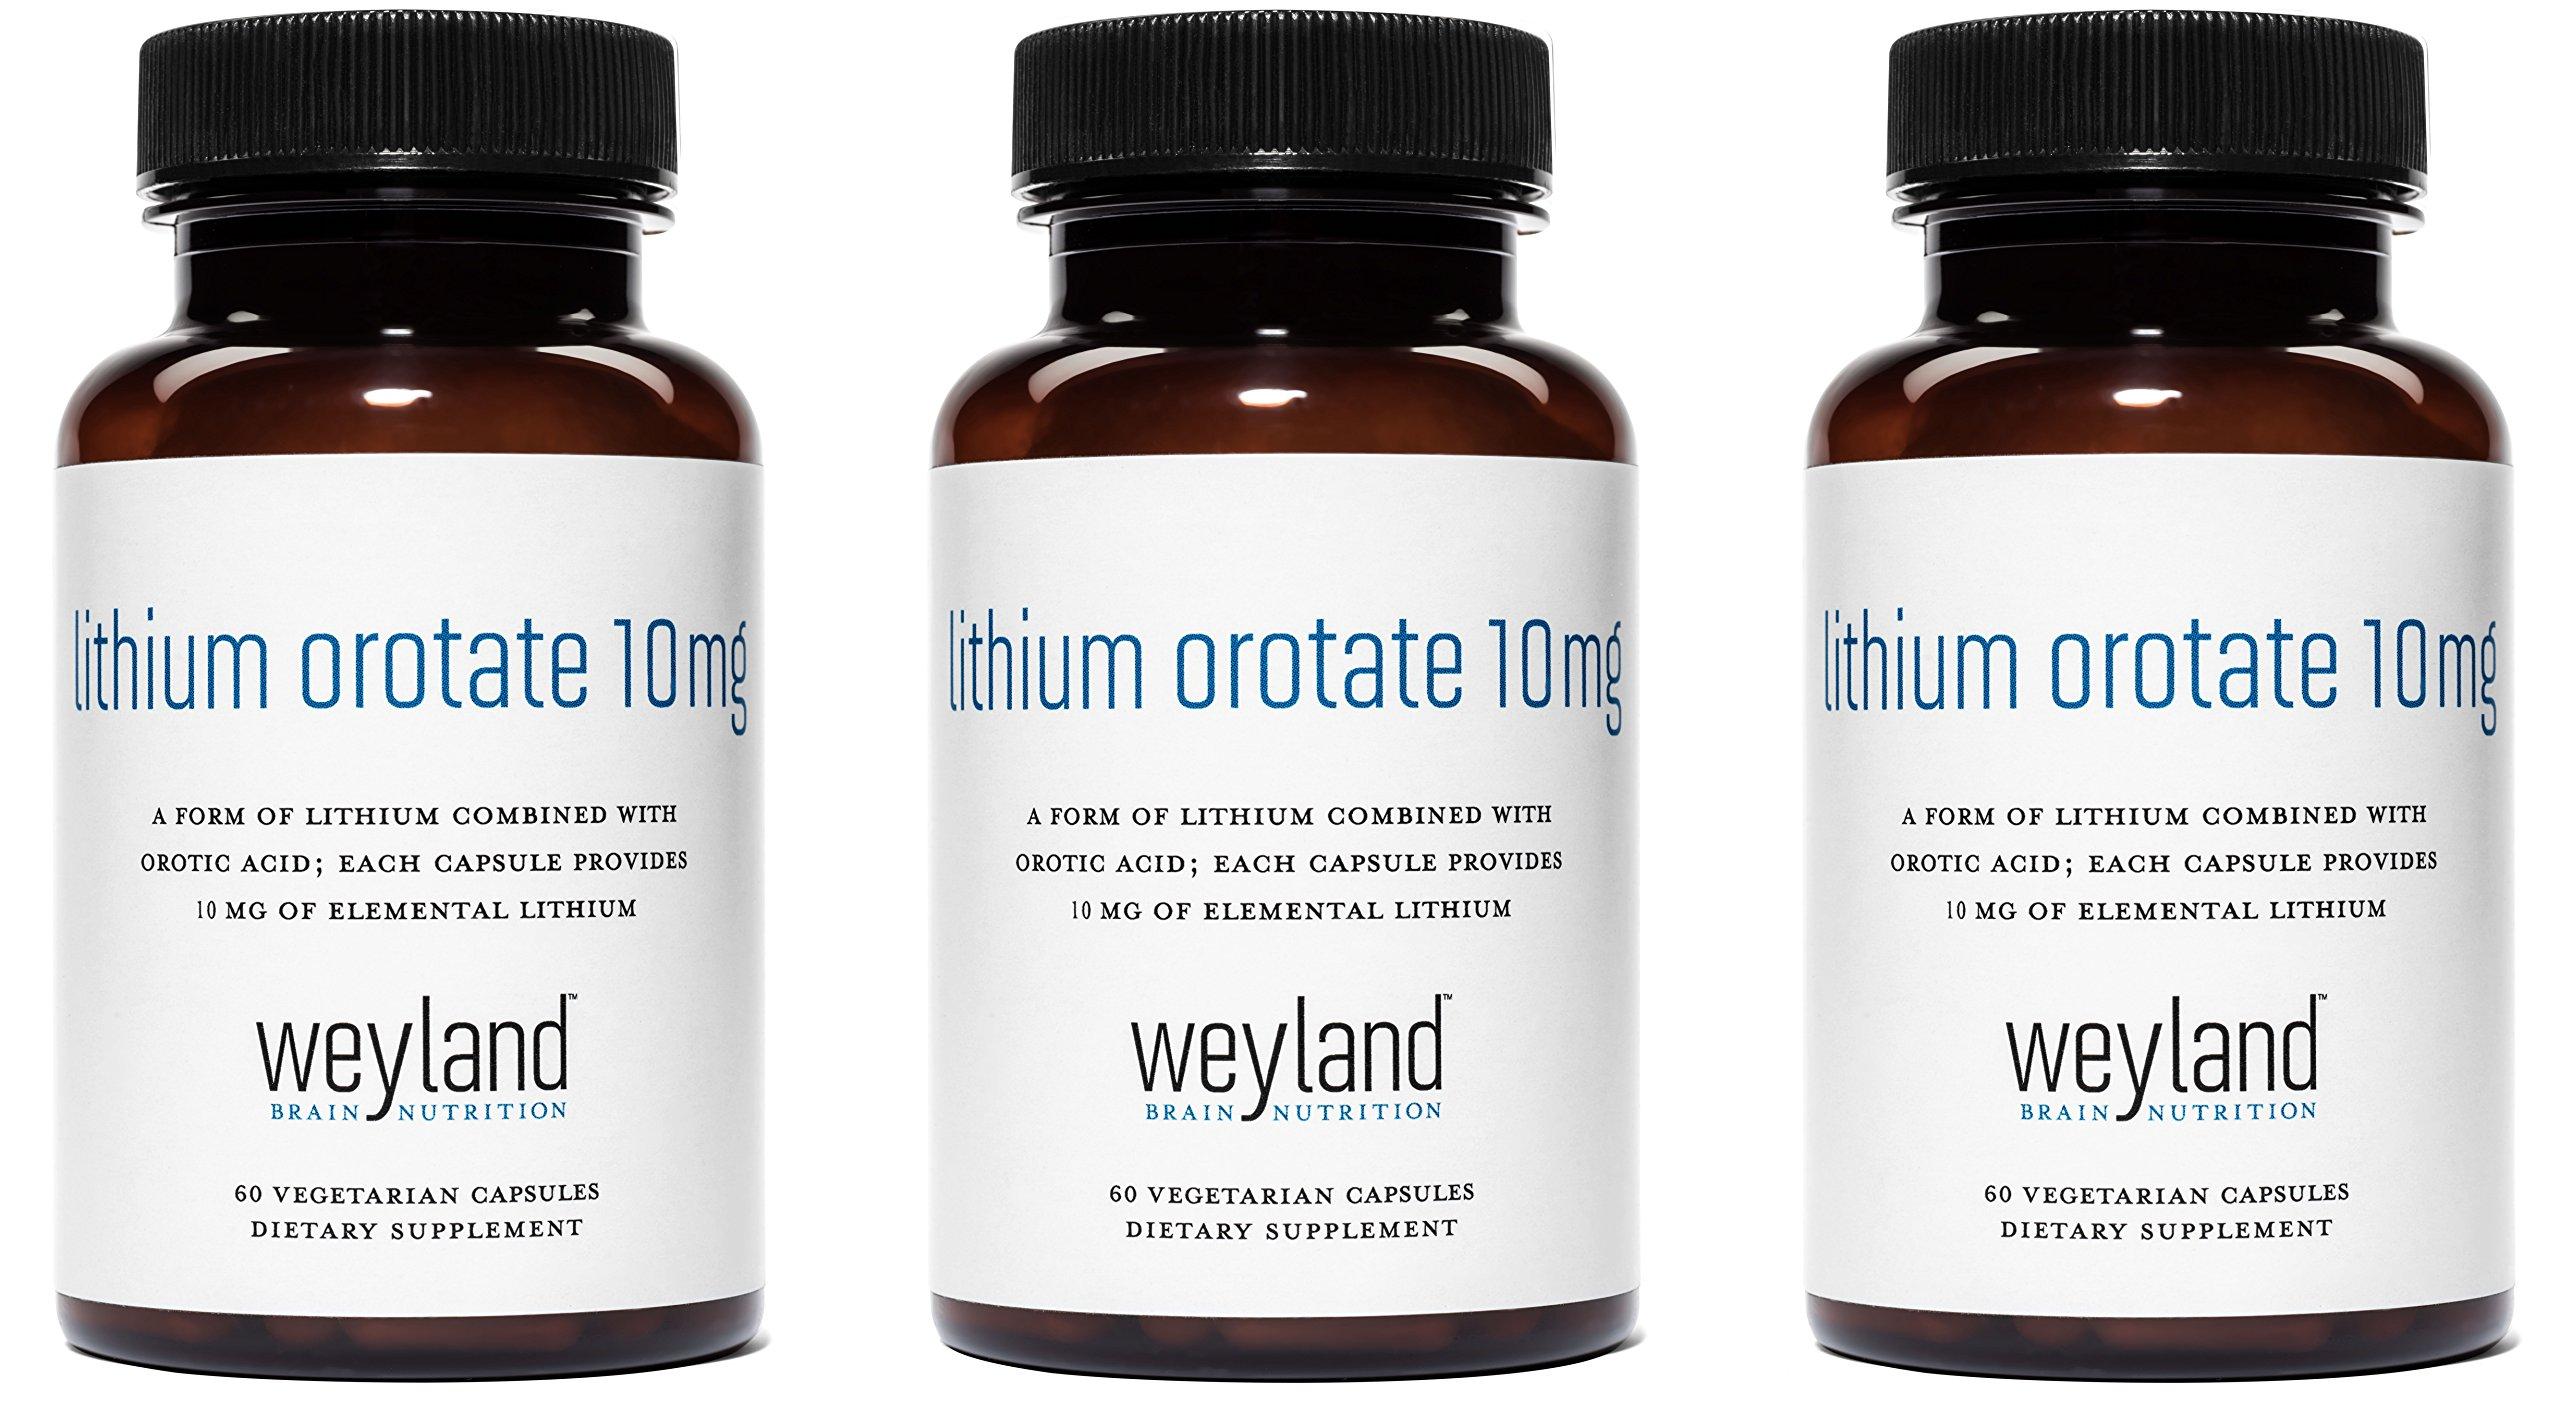 Weyland: Lithium Orotate - 10mg of Elemental Lithium (as Lithium Orotate) per Vegetarian Capsule (3 Bottles)